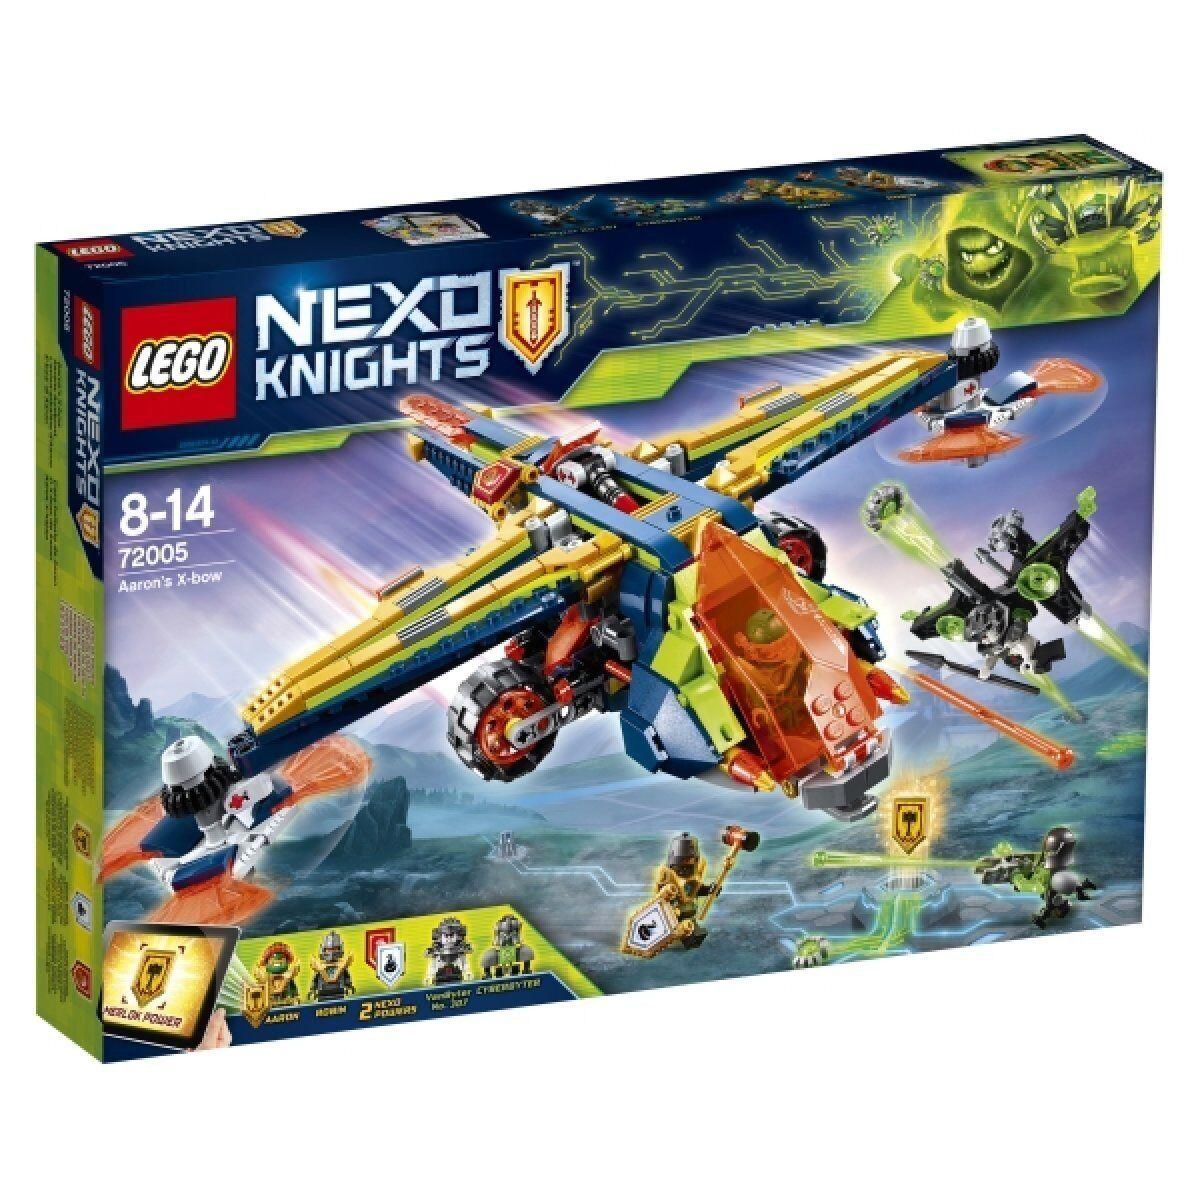 LEGO 72005 NEXO KNIGHTS Aarons Armbrust NEU OVP